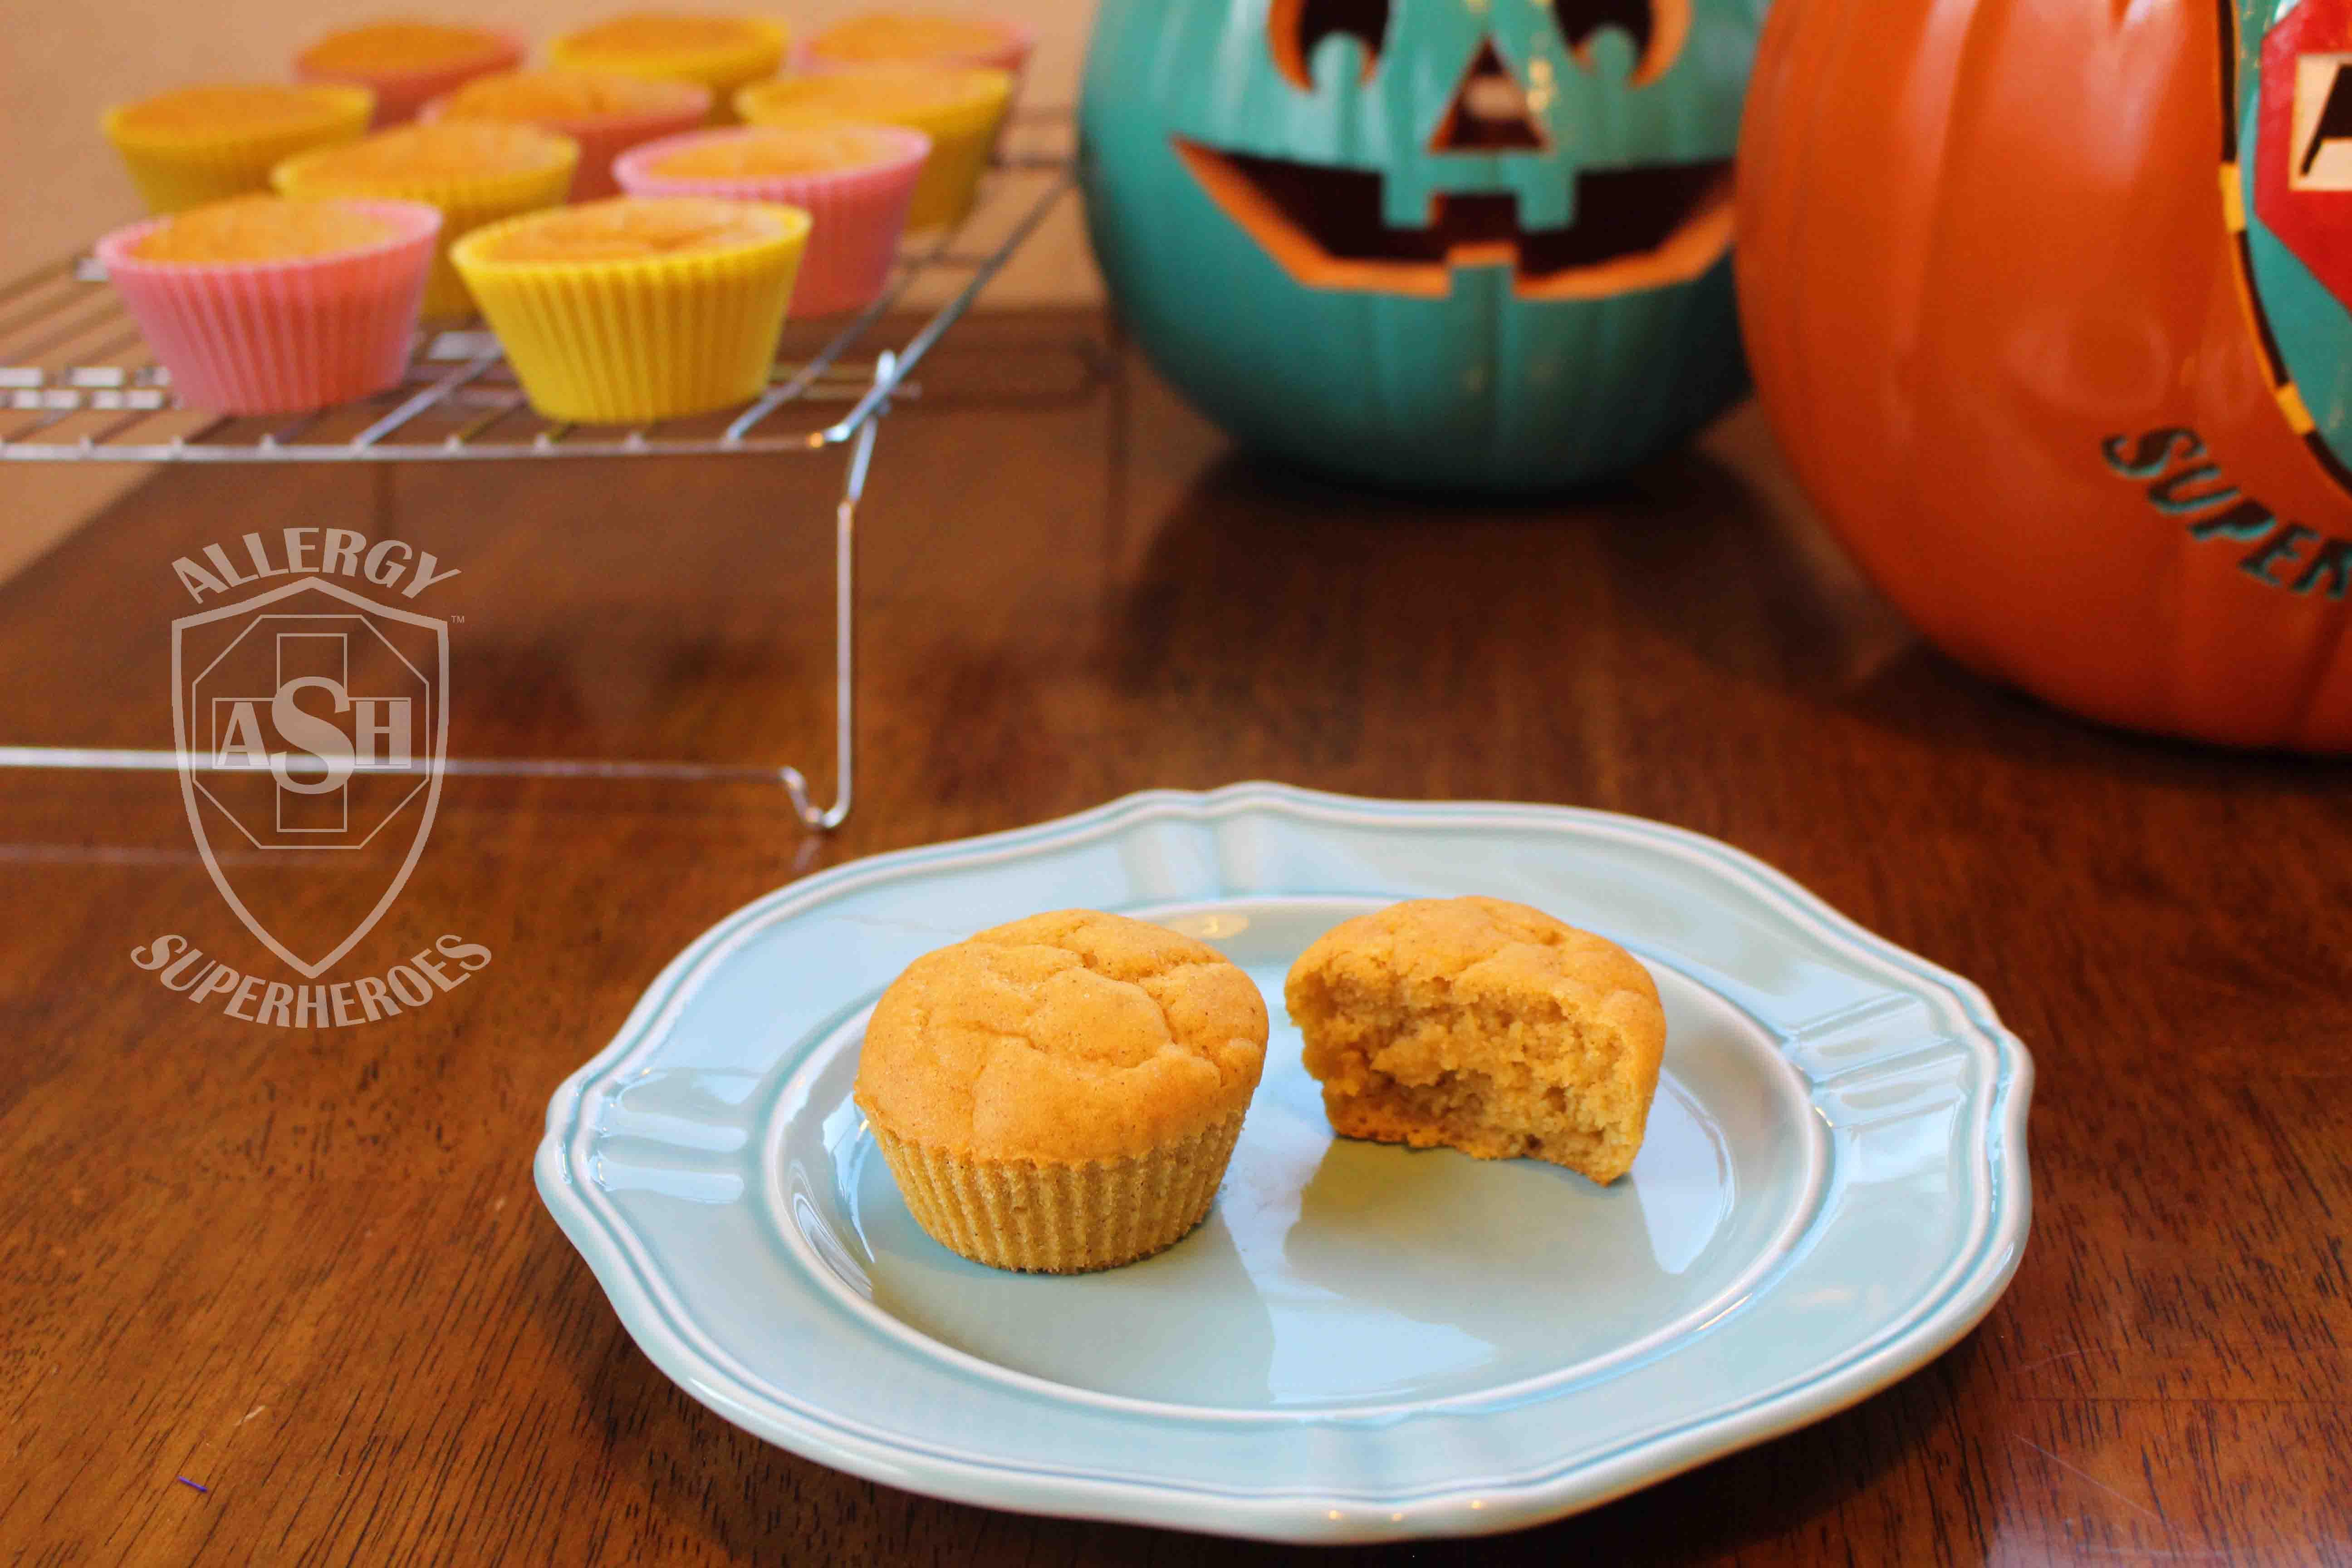 Pumpkin spice muffins allergy superheroes blog delicious pumpkin spice muffins from allergy superheroes forumfinder Choice Image